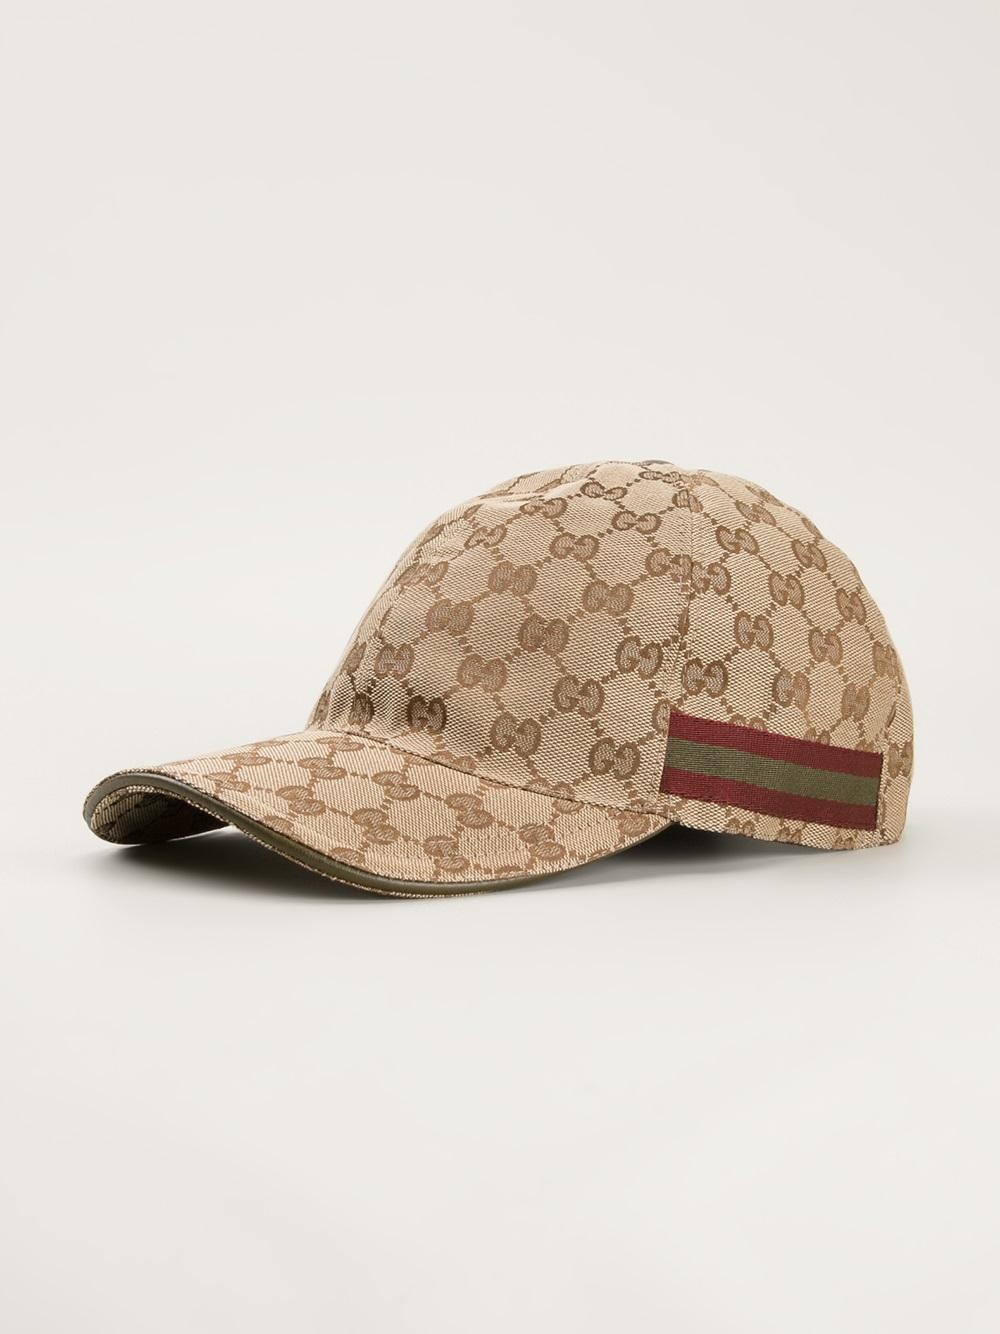 514ba4bf7f94c5 Lyst - Gucci Strap Back Baseball Cap in Natural for Men